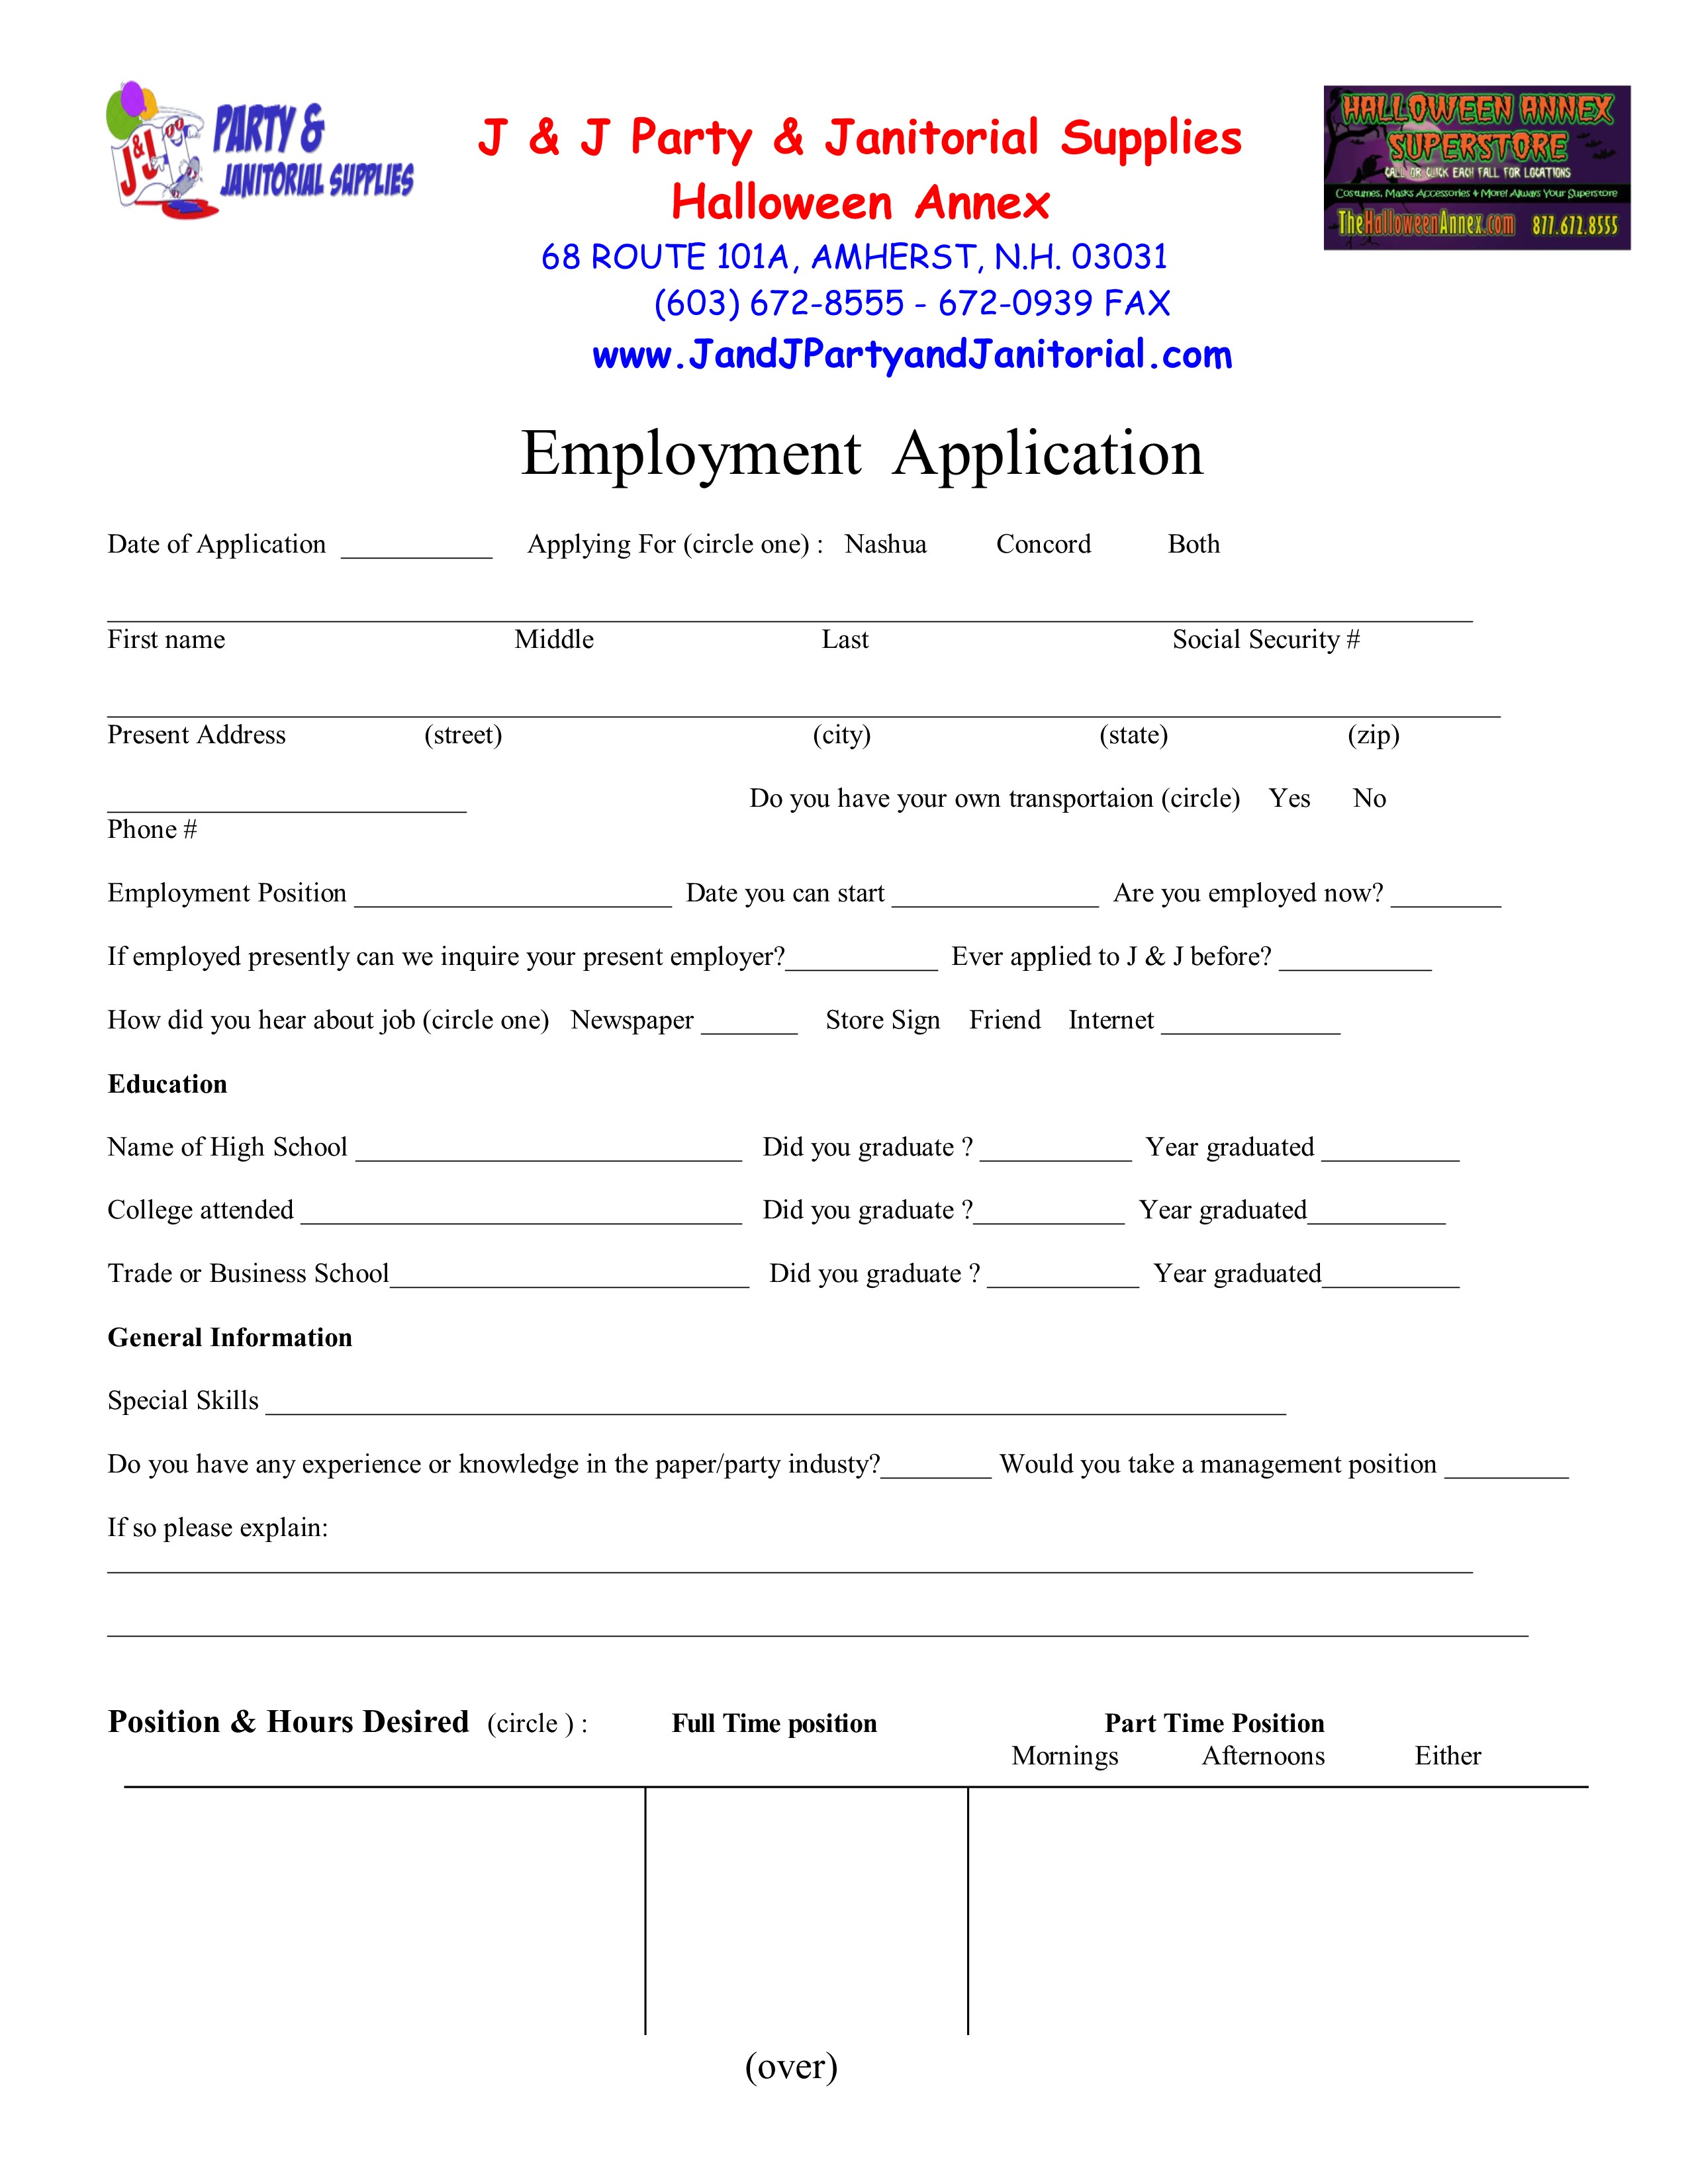 Employment Applications - J & J Party & Janitorial Supplies L.L.C.